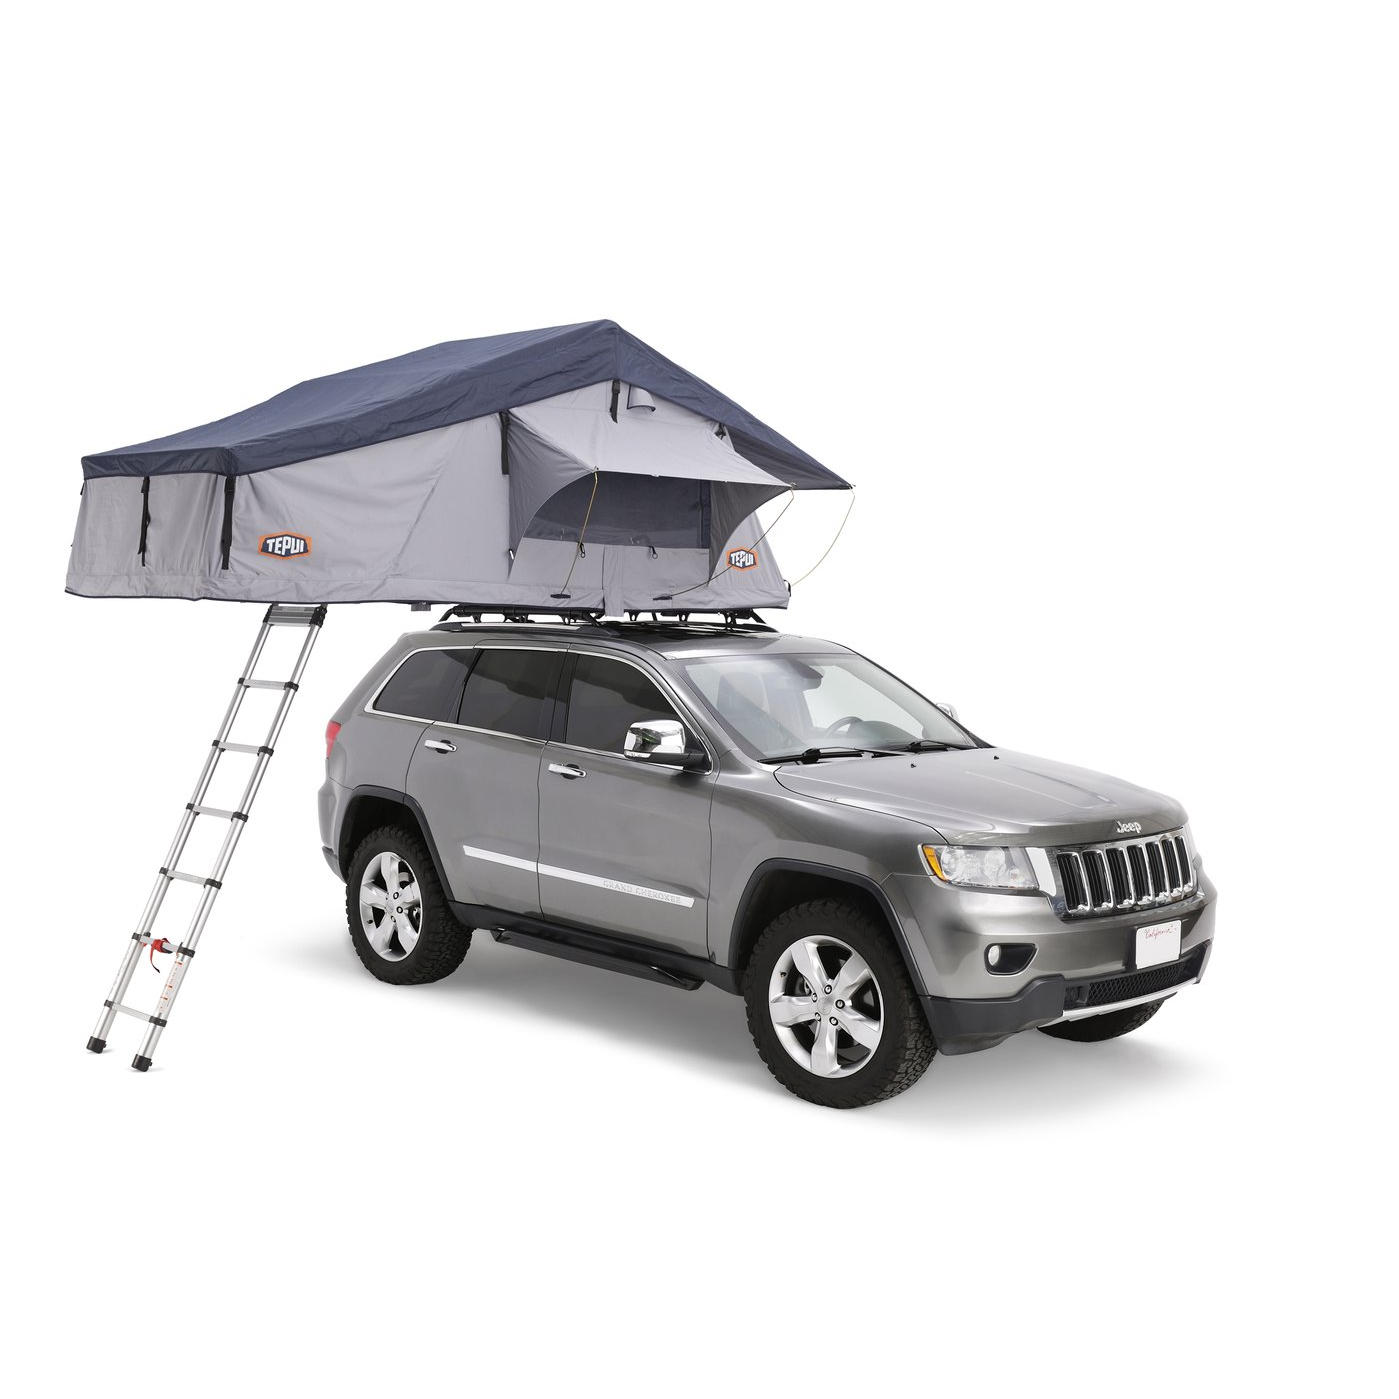 Thule Tepui Explorer Autana 3 Tent w/ Annex - Haze Gray